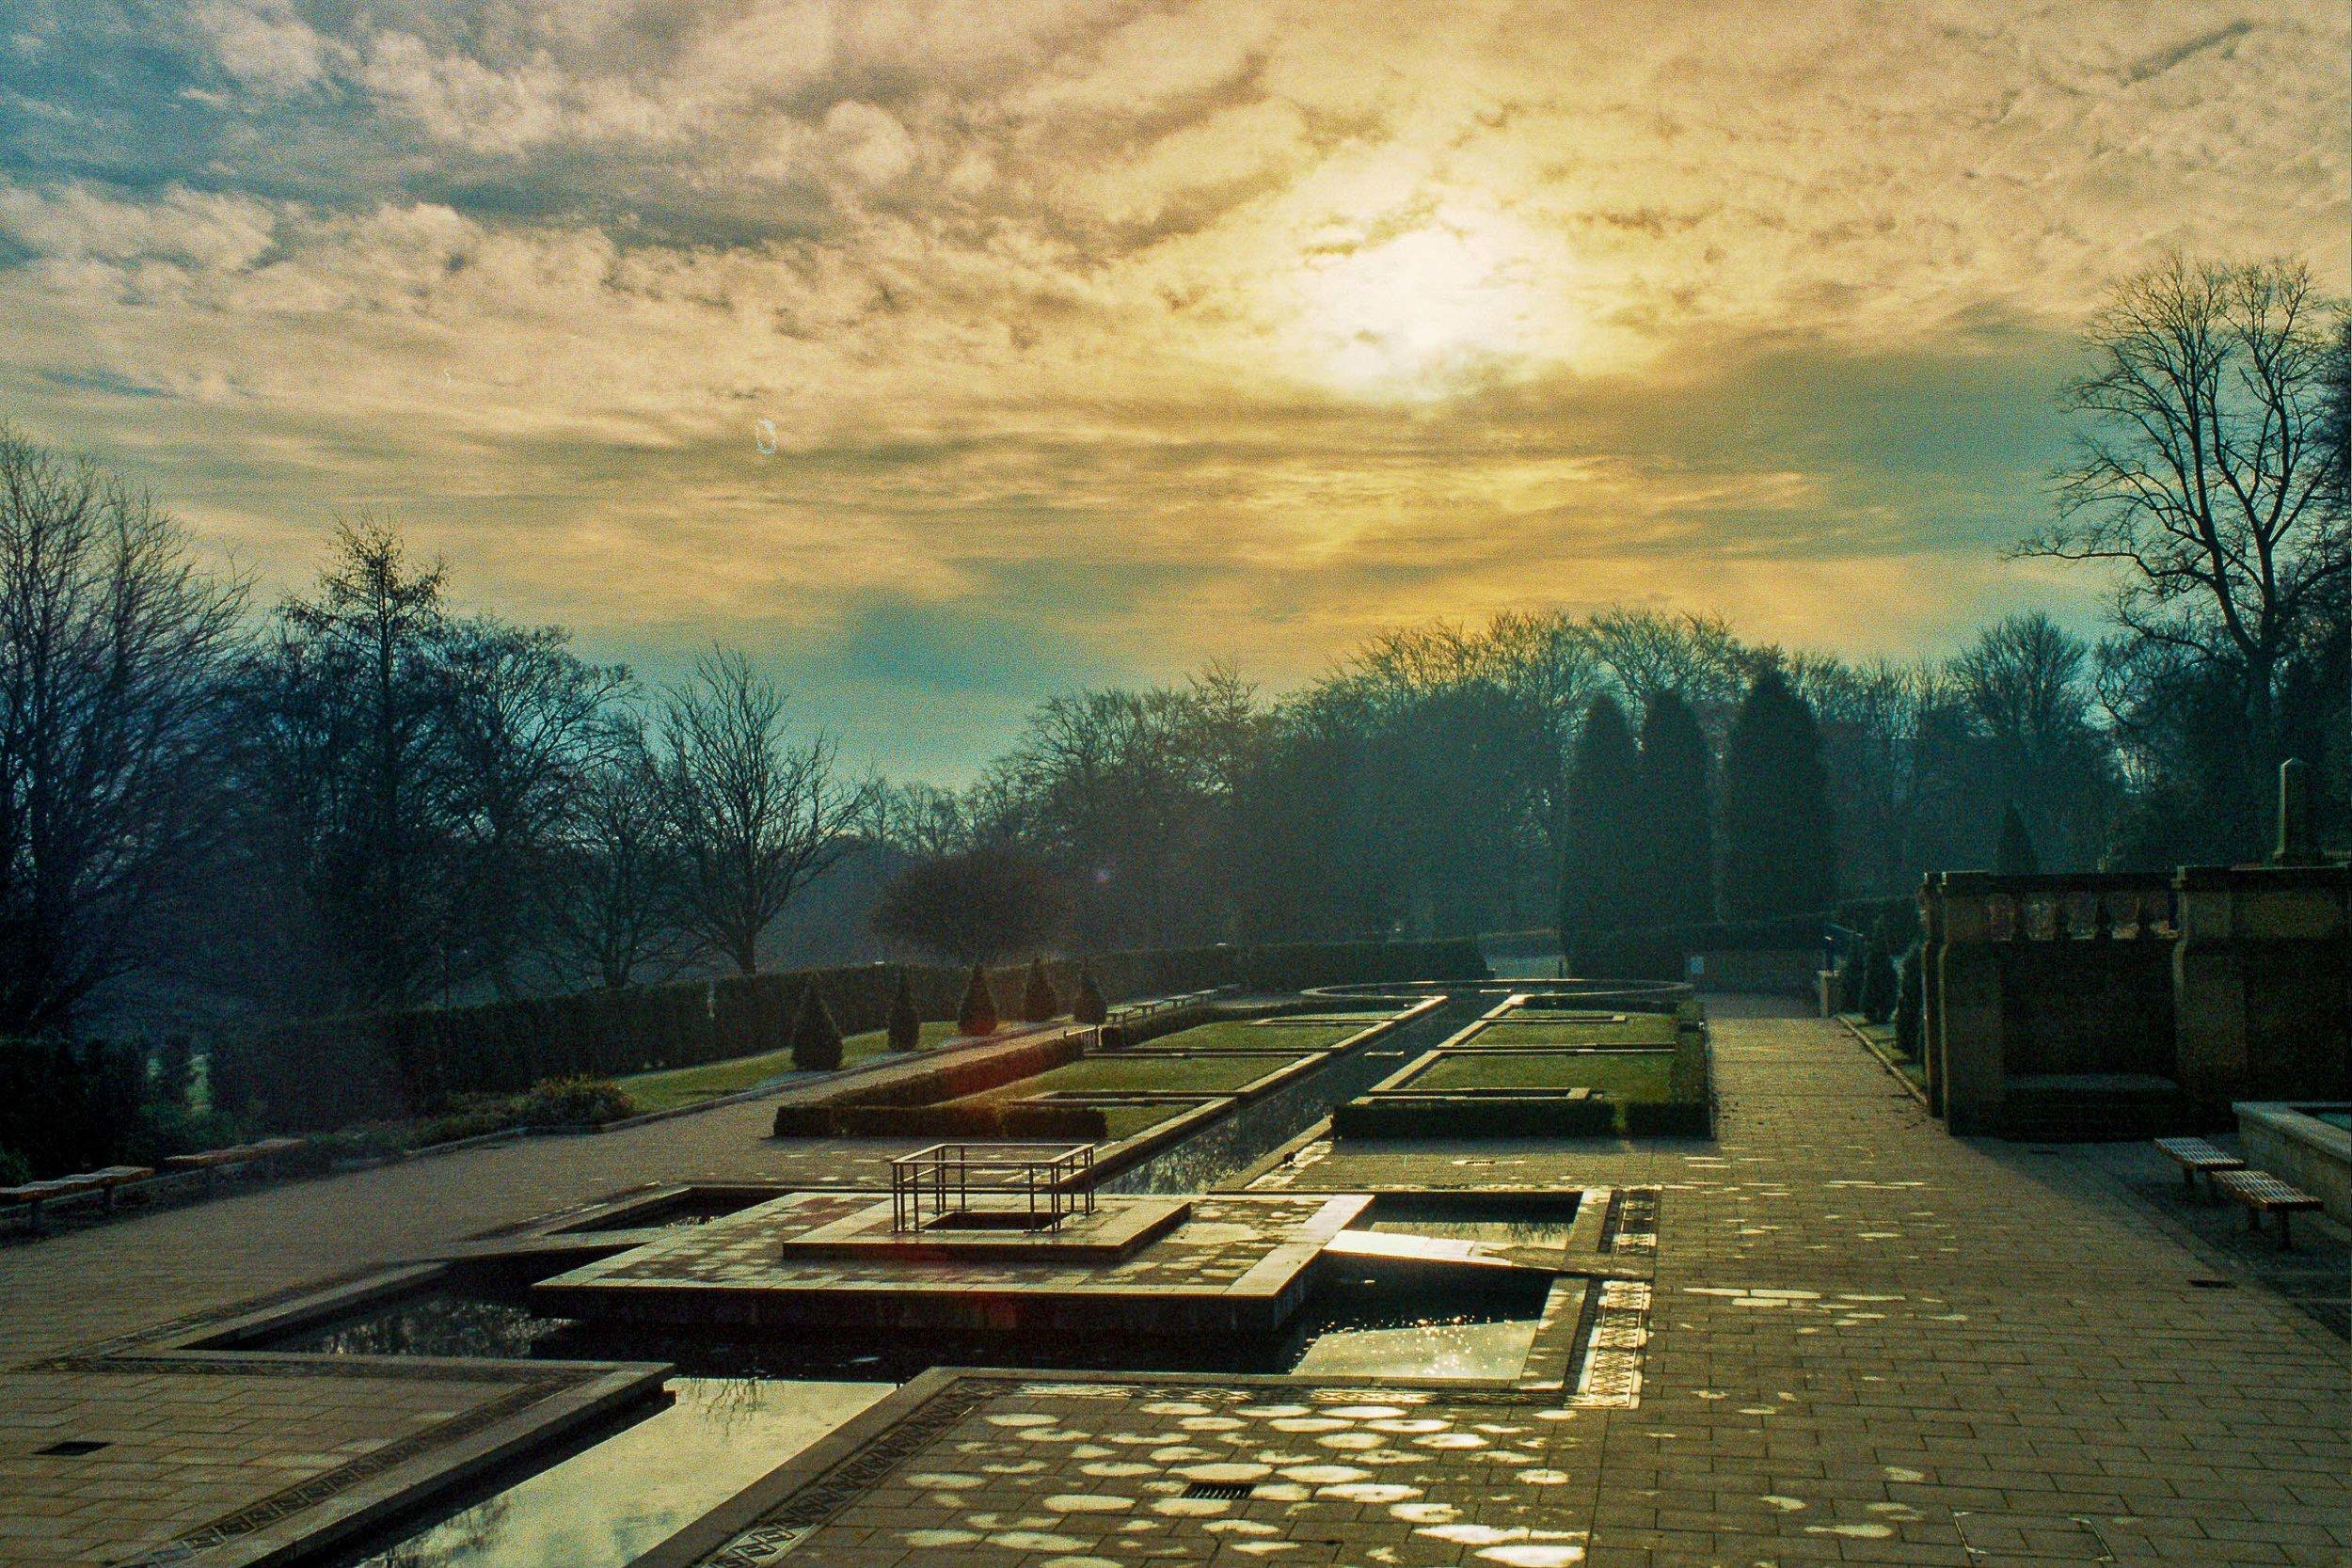 Lister Park - Mughal Gardens 2003